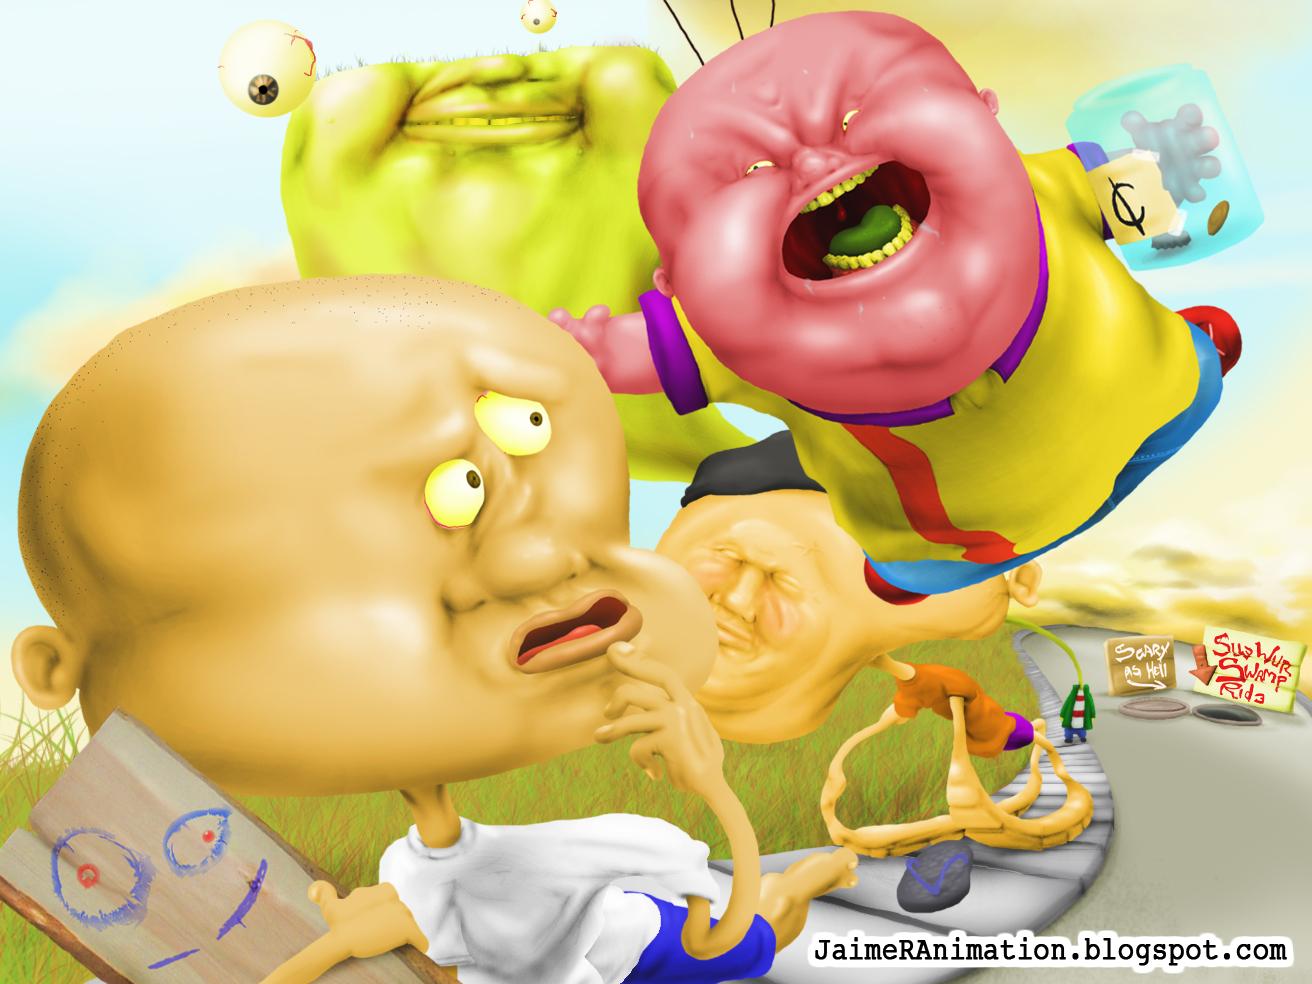 Jaime Rodriguez Animation Ed Edd N Eddy Illustrations